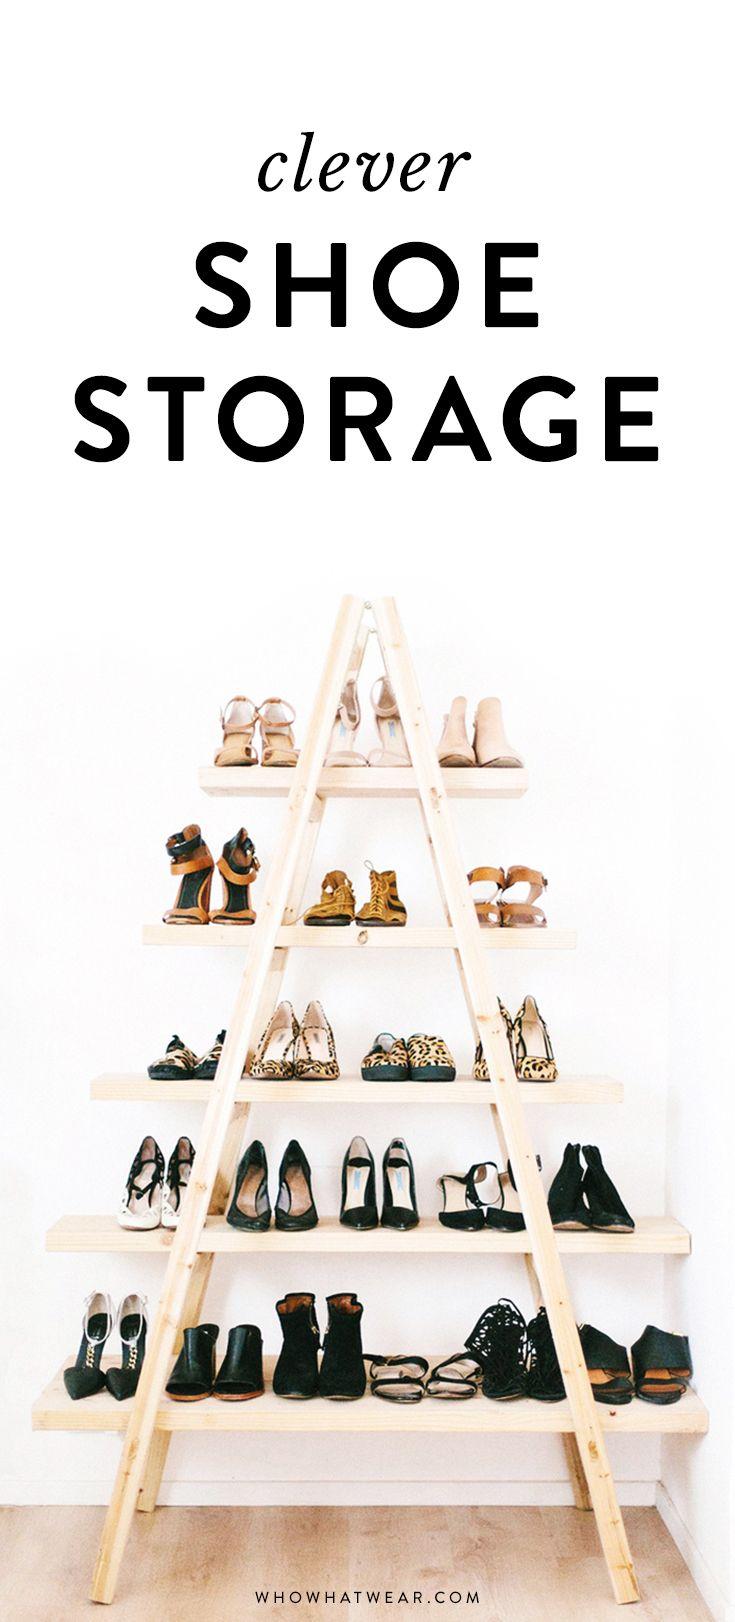 Shoe organization 101: Clever shoe storage ideas.